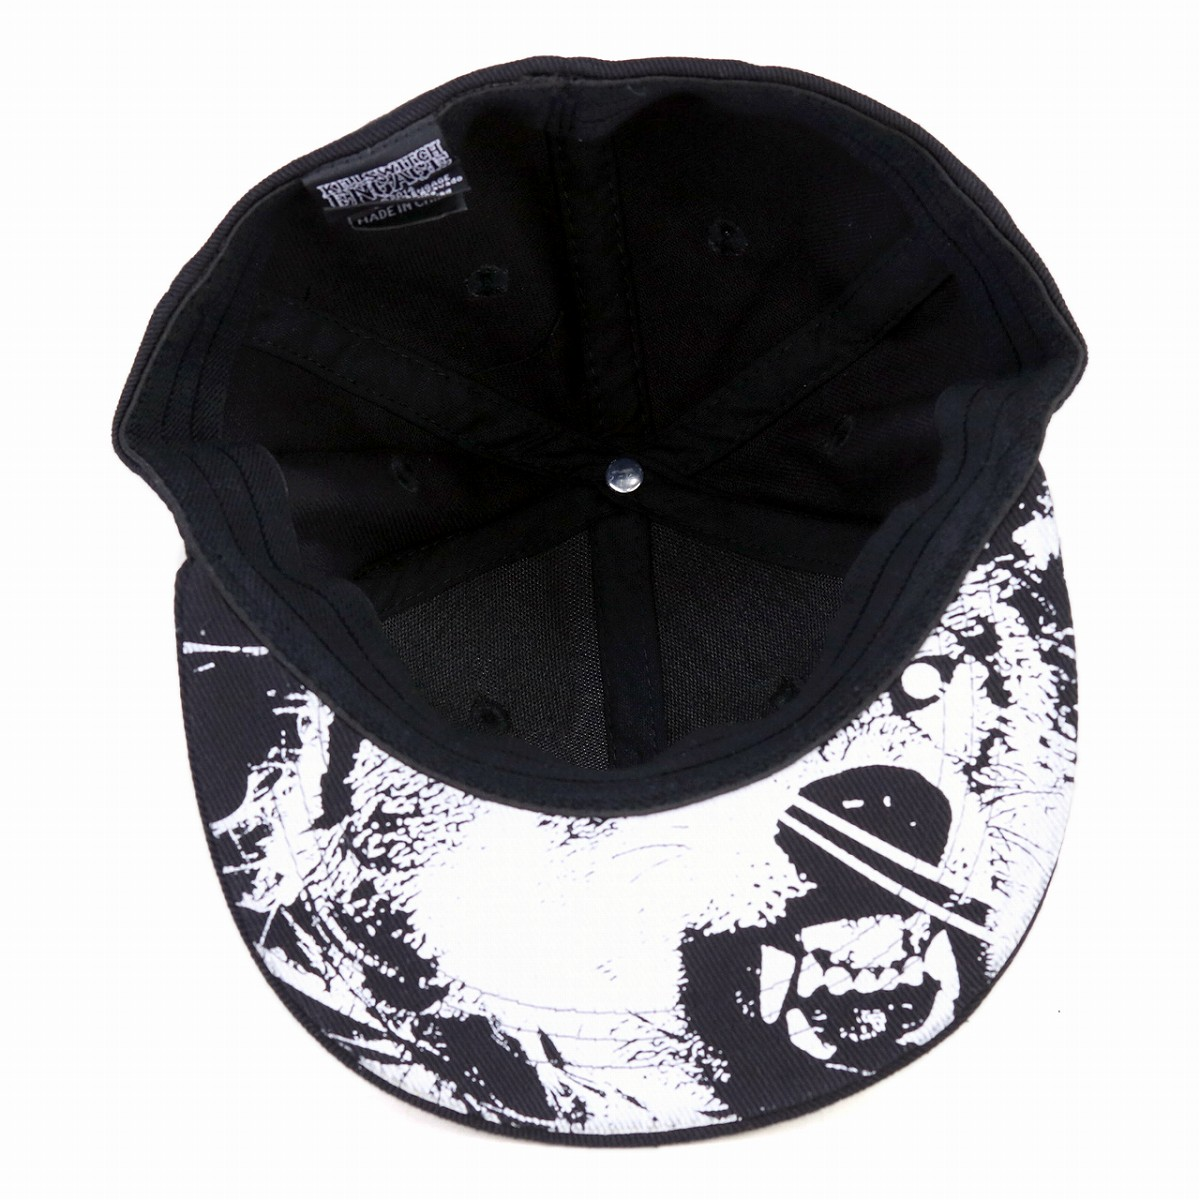 b017823ce63 ELEHELM HAT STORE  Paint black black baseball cap men  baseball cap ...